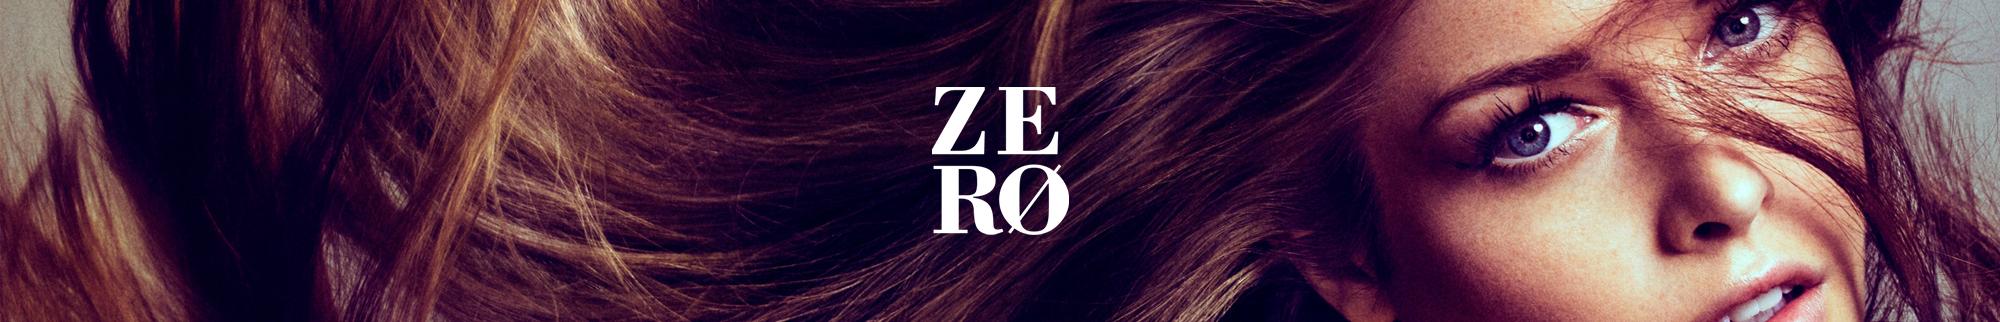 KOLORA ZERO – revolution in hair coloring at home.